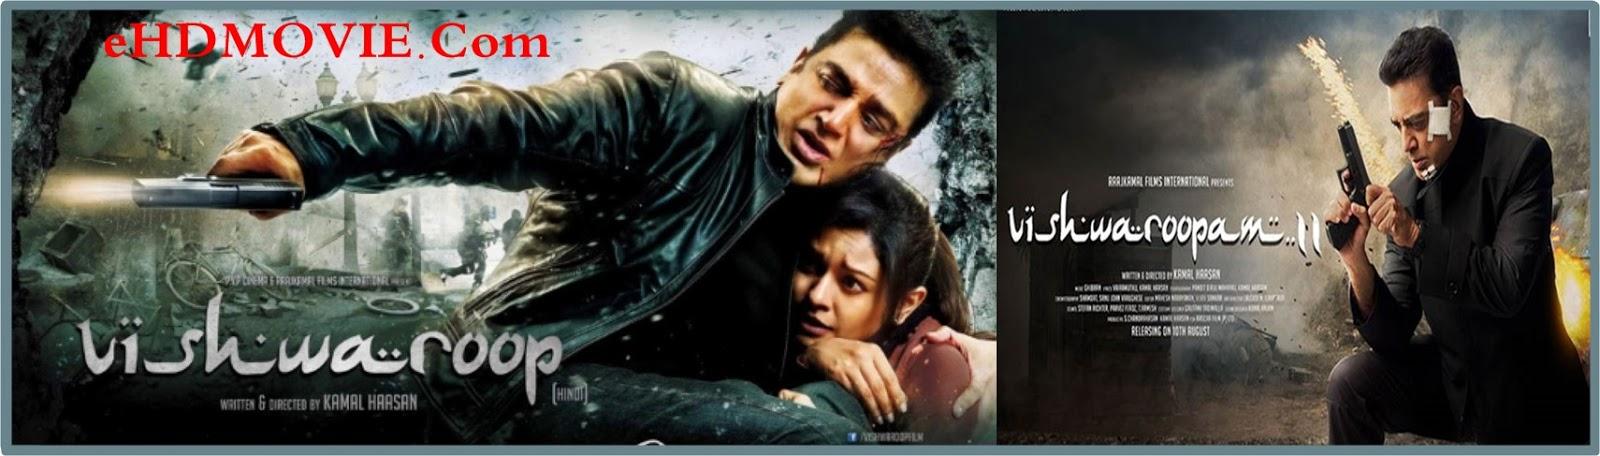 Vishwaroopam II 2018 Full Movie Hindi 720p - 480p ORG HDRip 400MB - 1.4GB ESubs Free Download